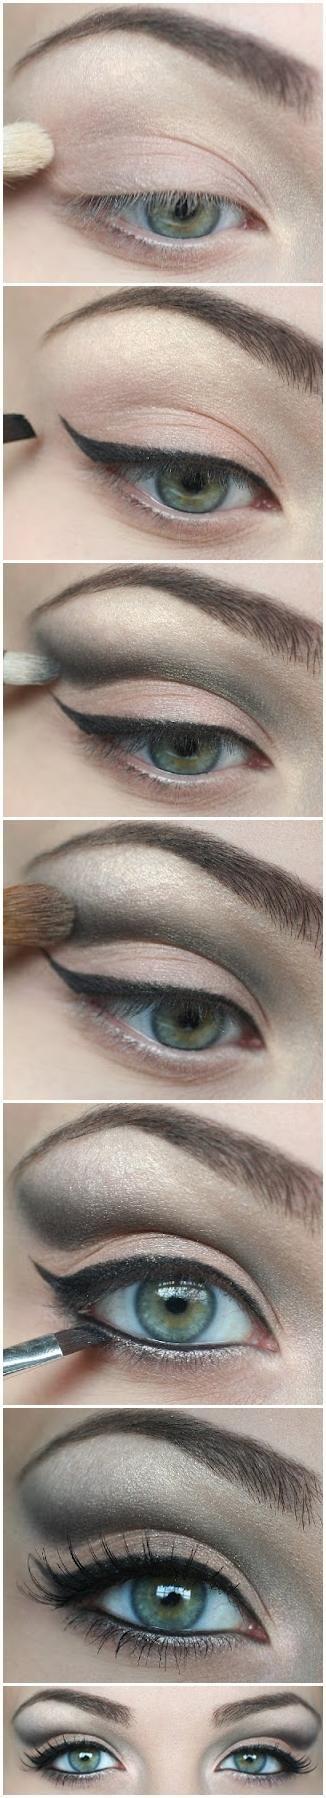 Eyeshadow for saggy eyelids